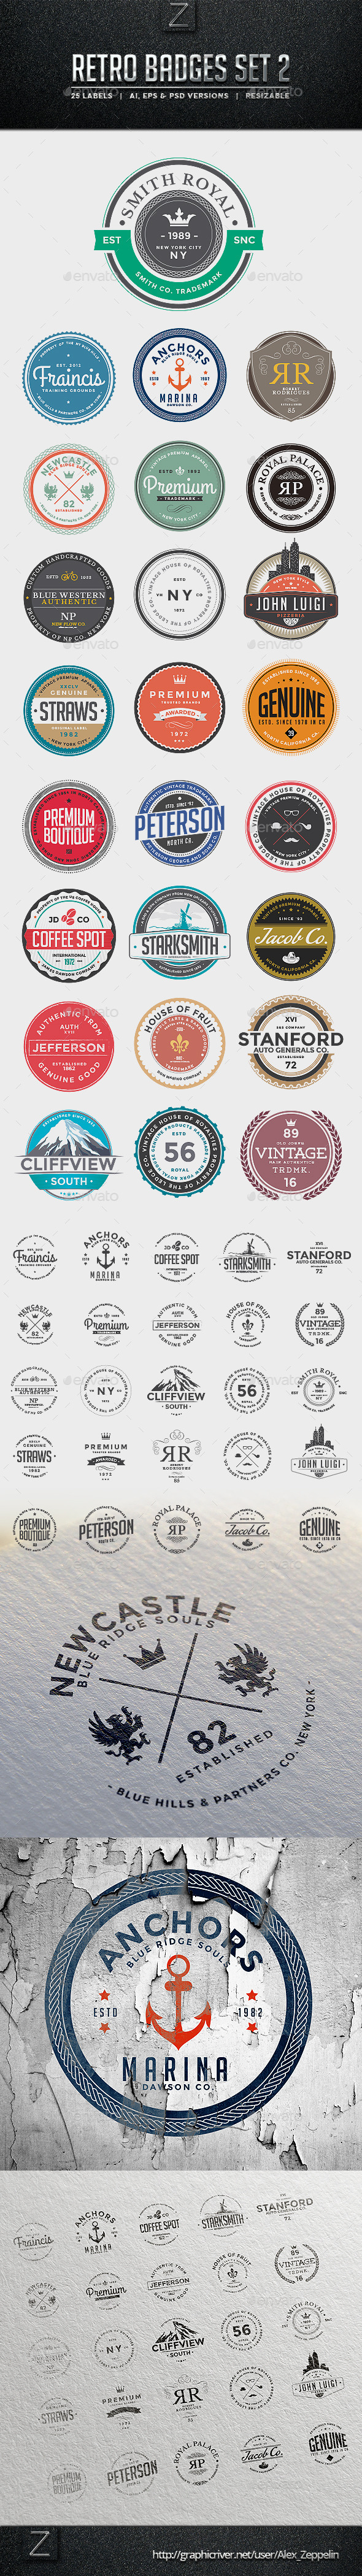 Retro Badges Set 2 - Badges & Stickers Web Elements